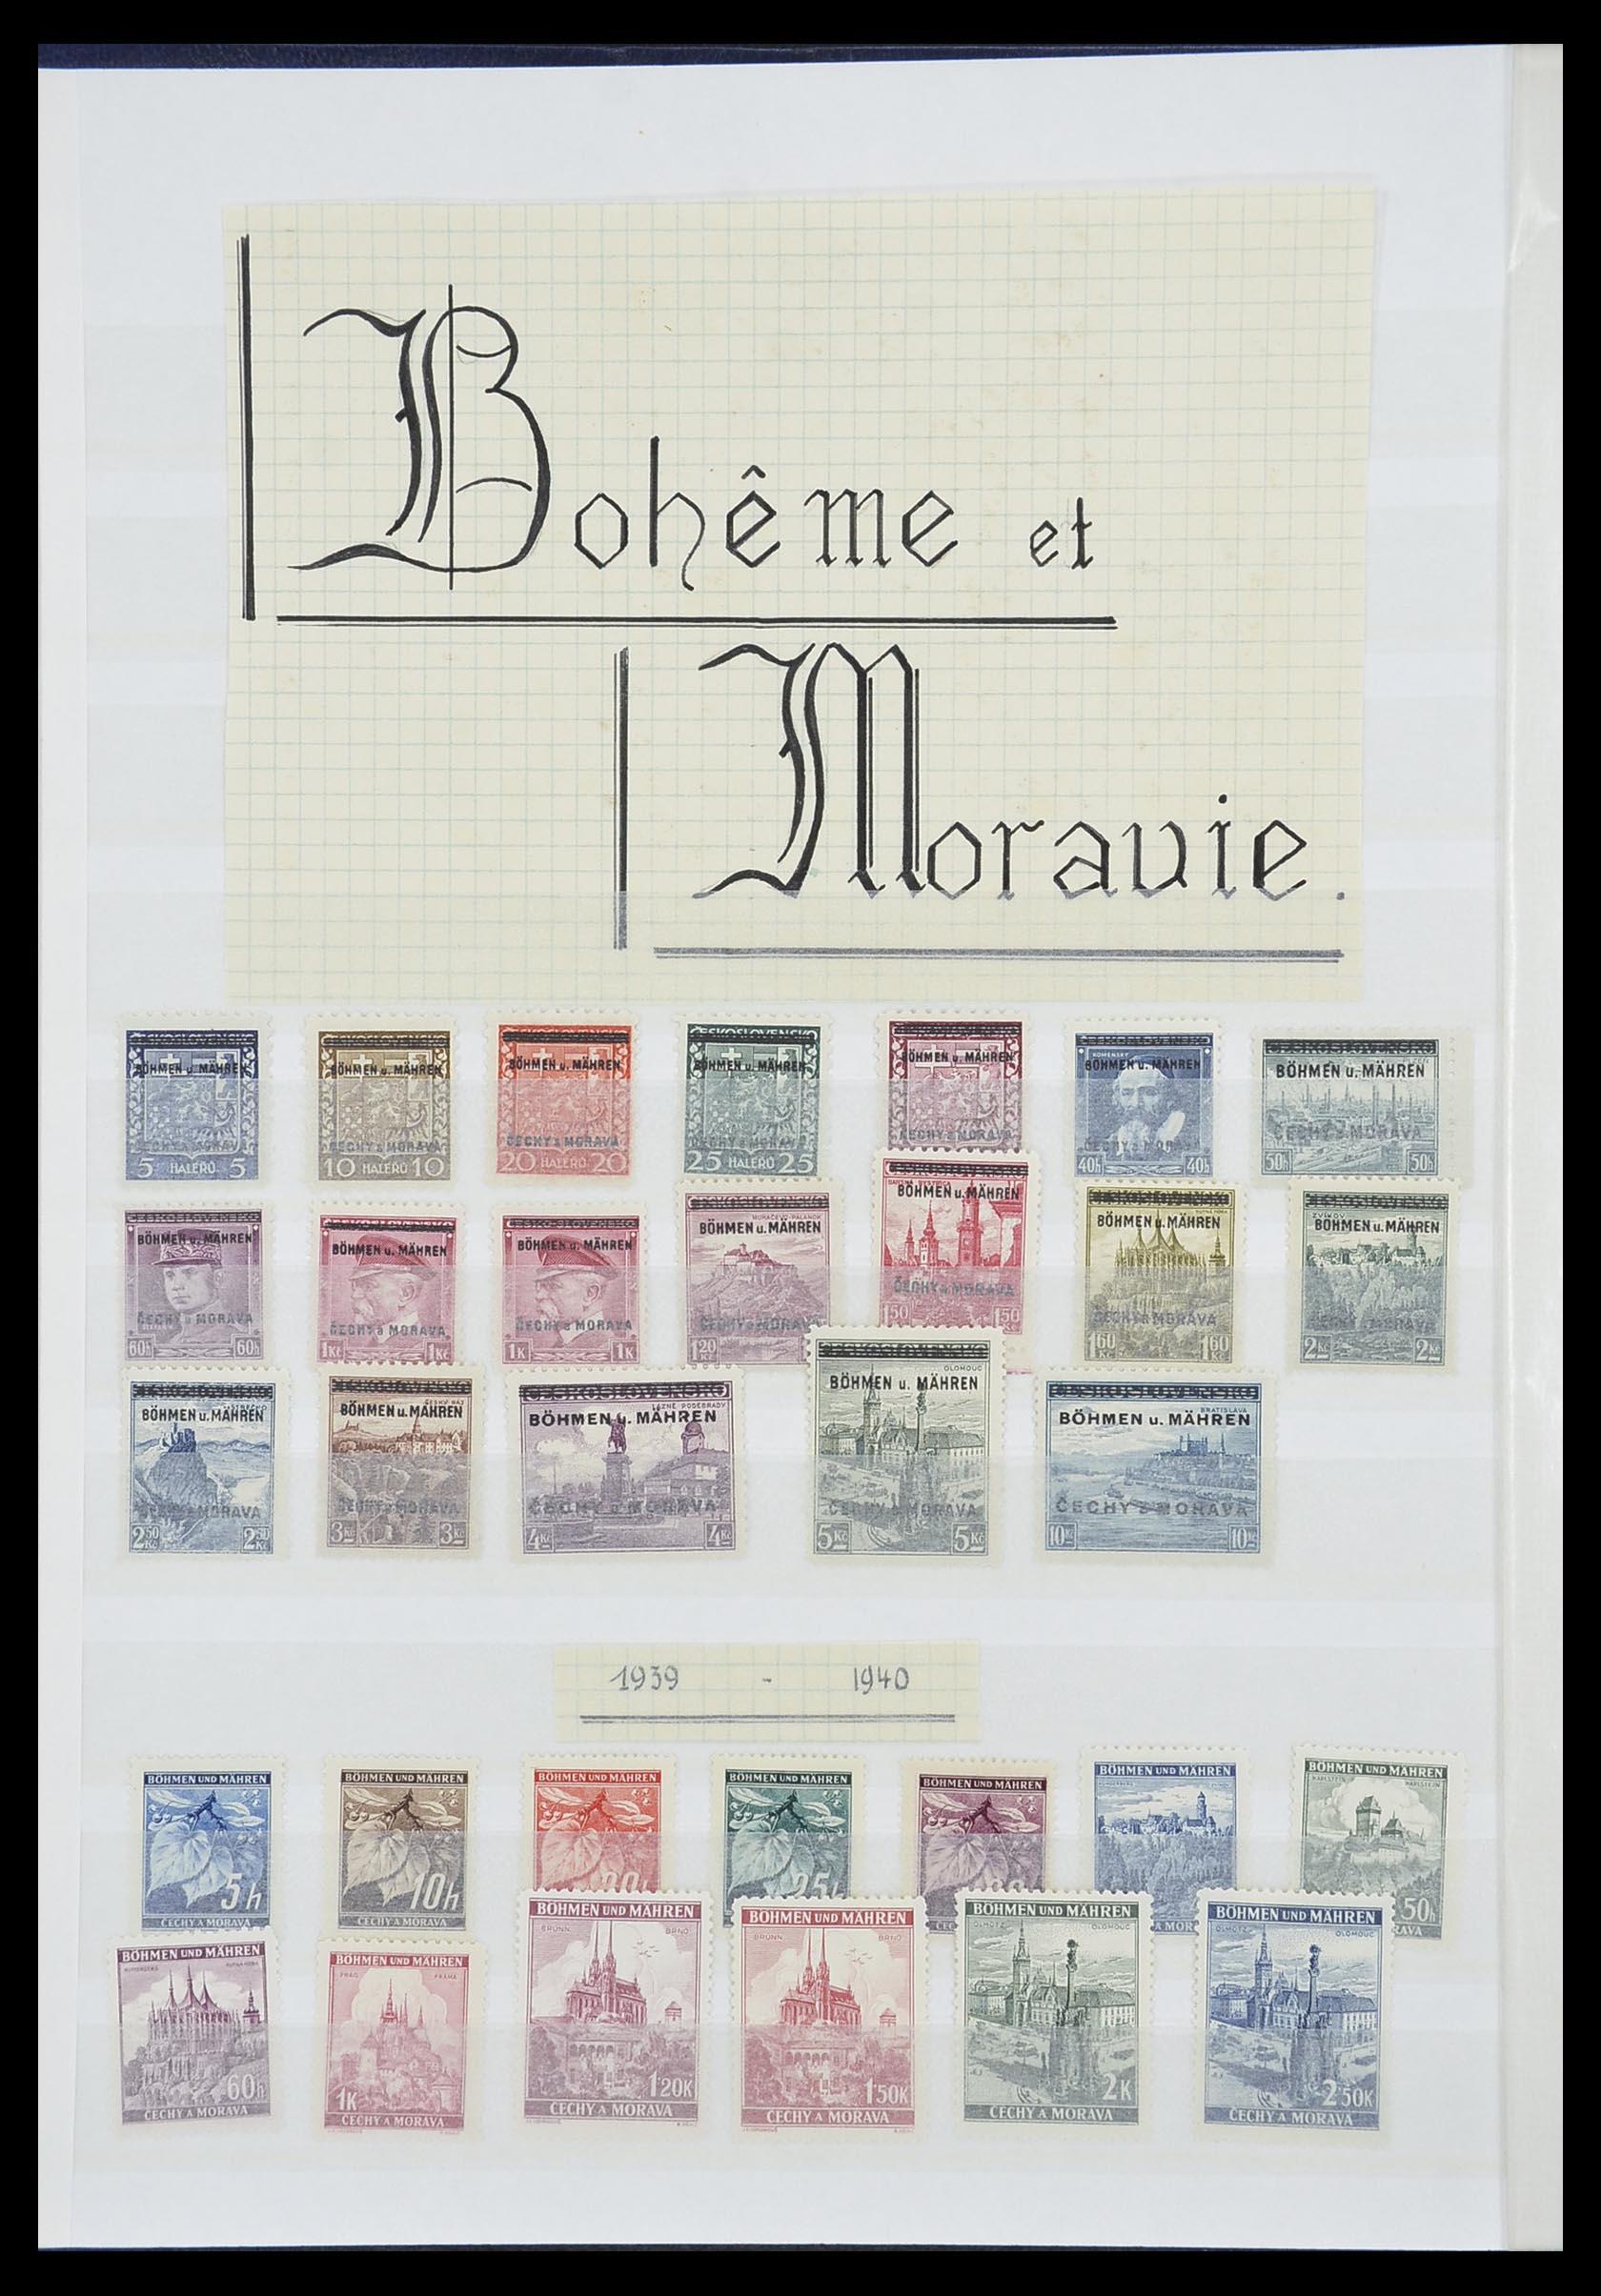 33850 008 - Postzegelverzameling 33850 Duitse bezettingen 2e wereldoorlog 1939-19